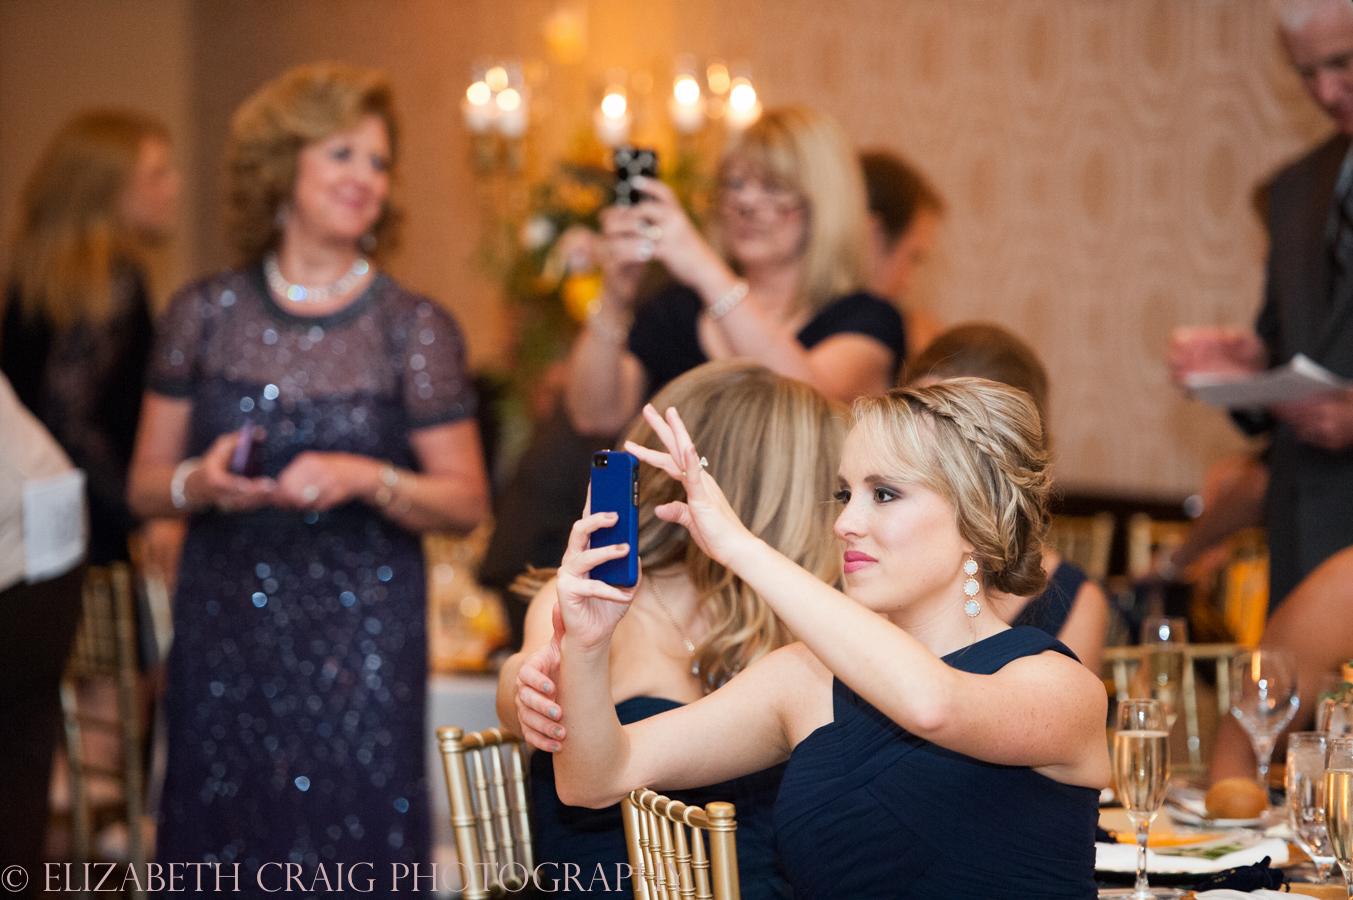 pittsburgh-greek-weddings-fairmont-weddings-receptions-elizabeth-craig-photohgraphy-021